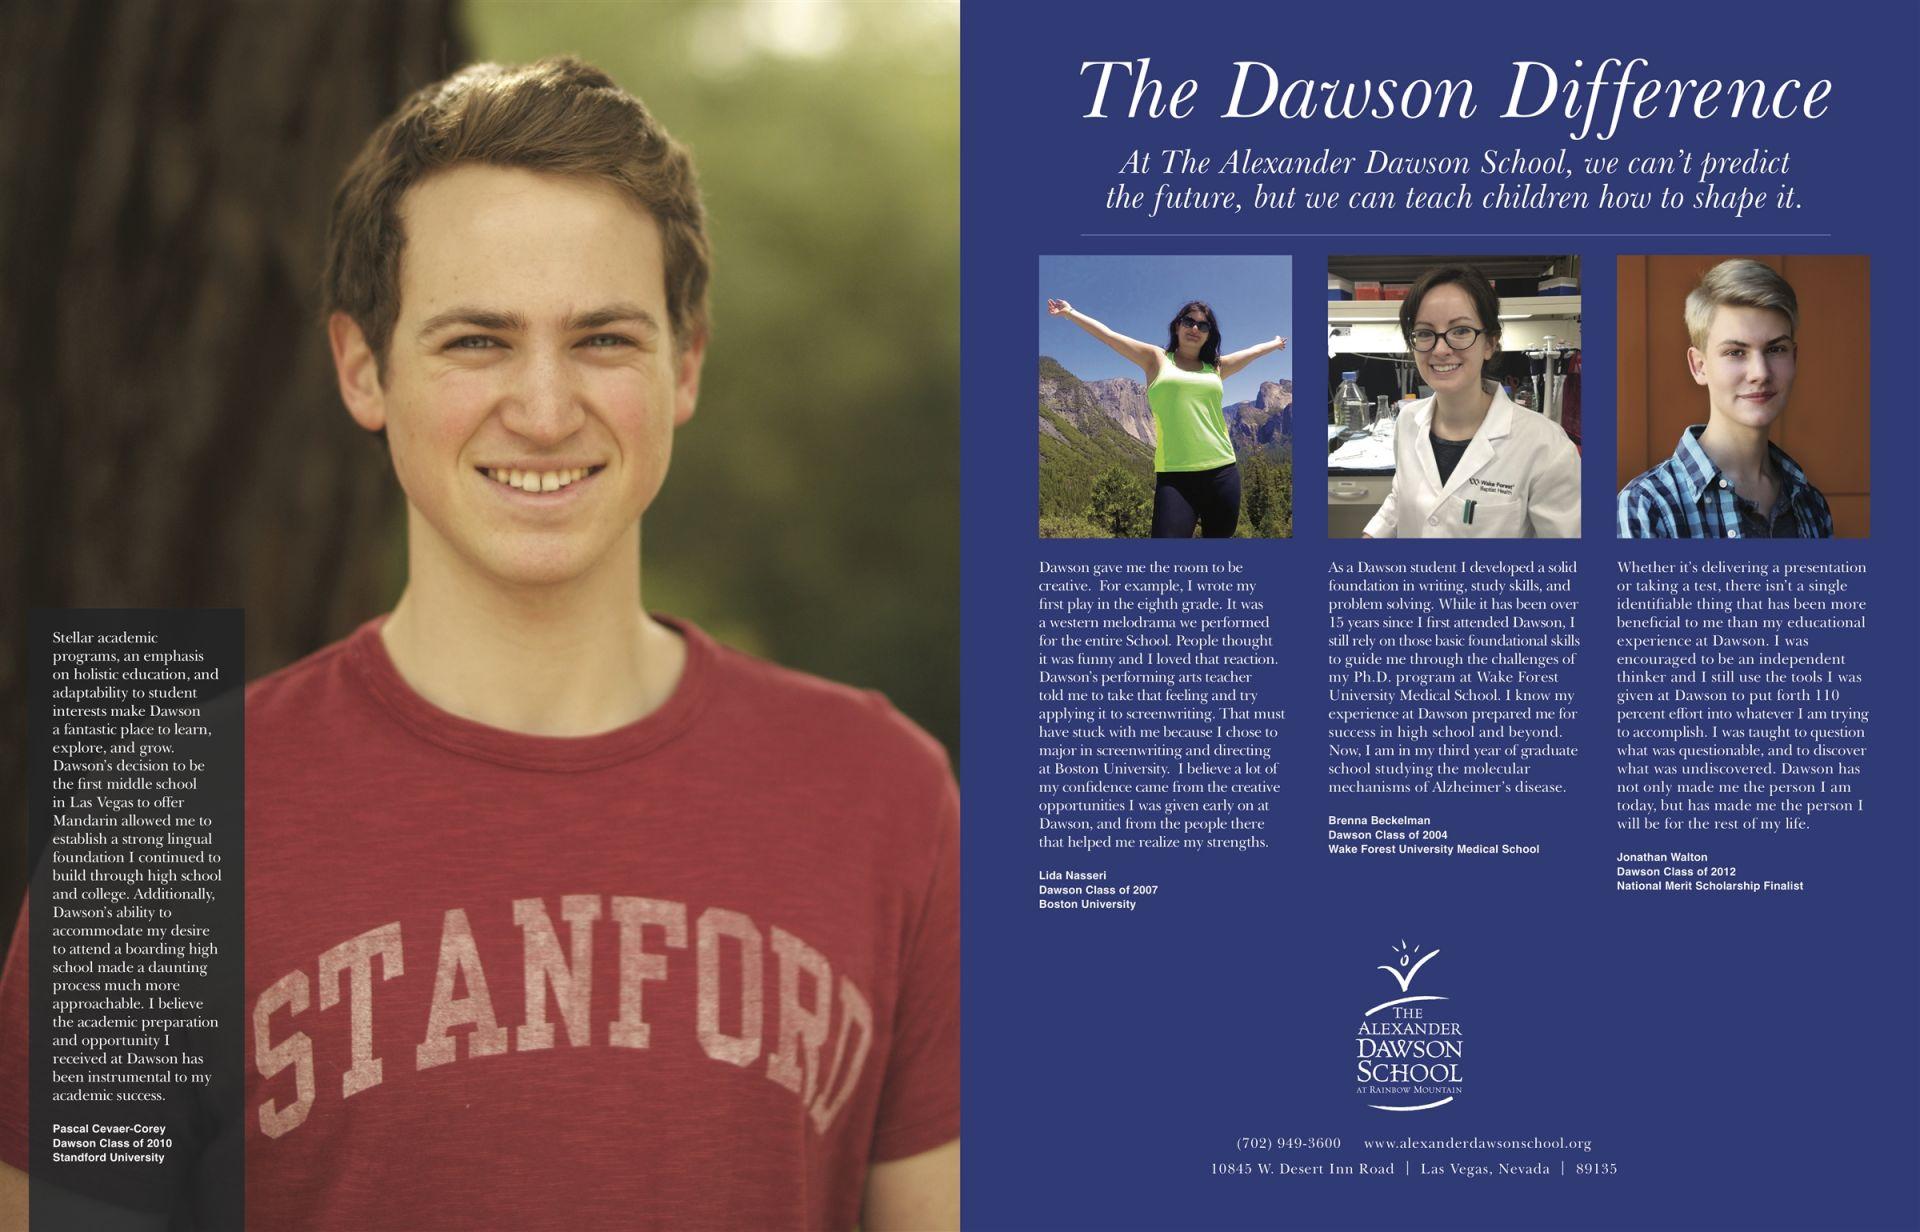 Alexander Dawson School | High School Placement Guidance